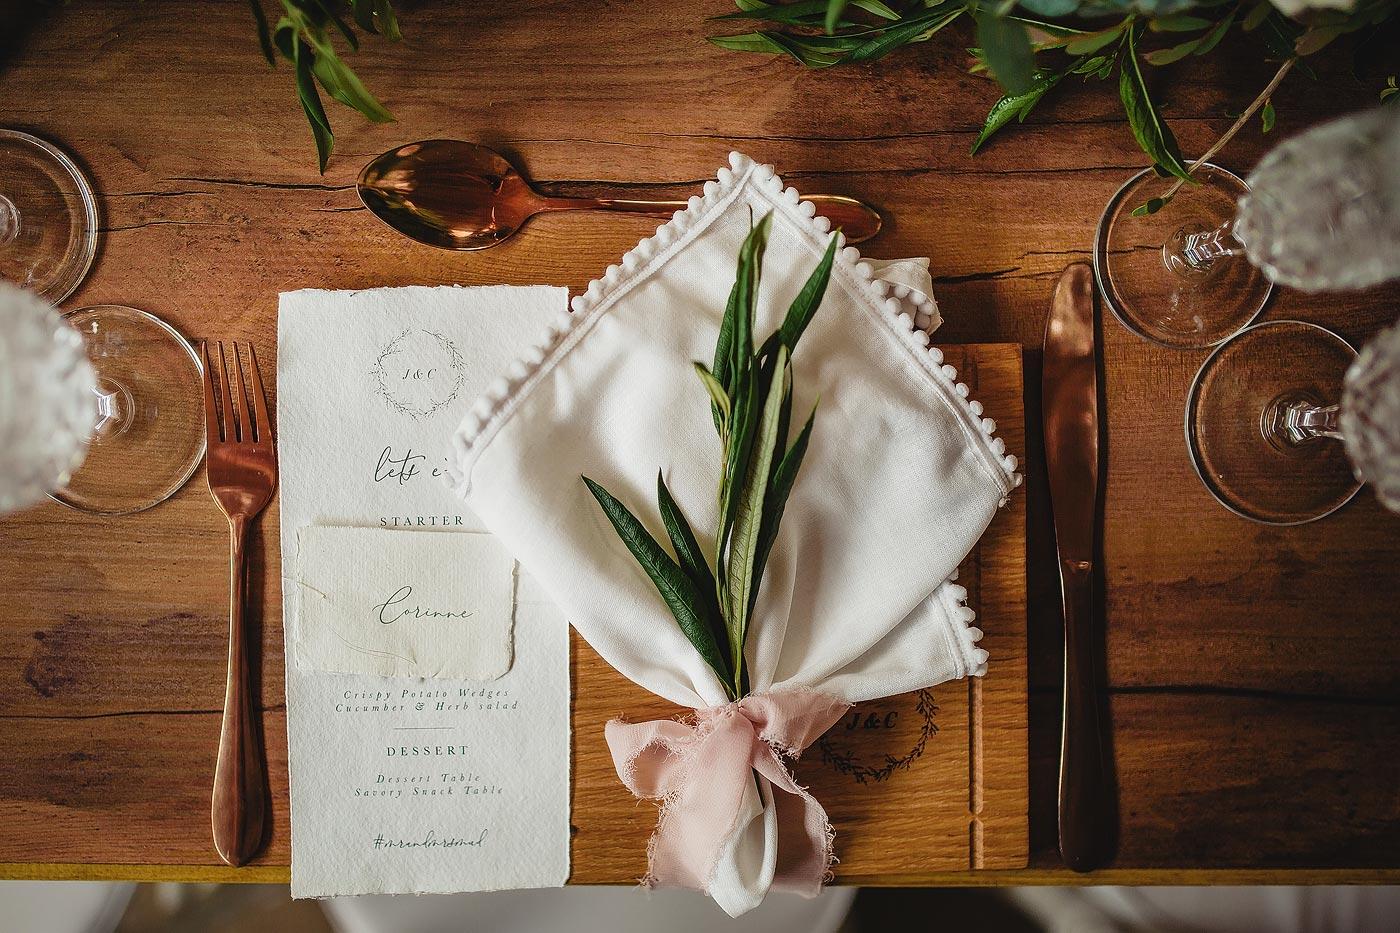 Rustic wedding decor, napkin and wedding menu